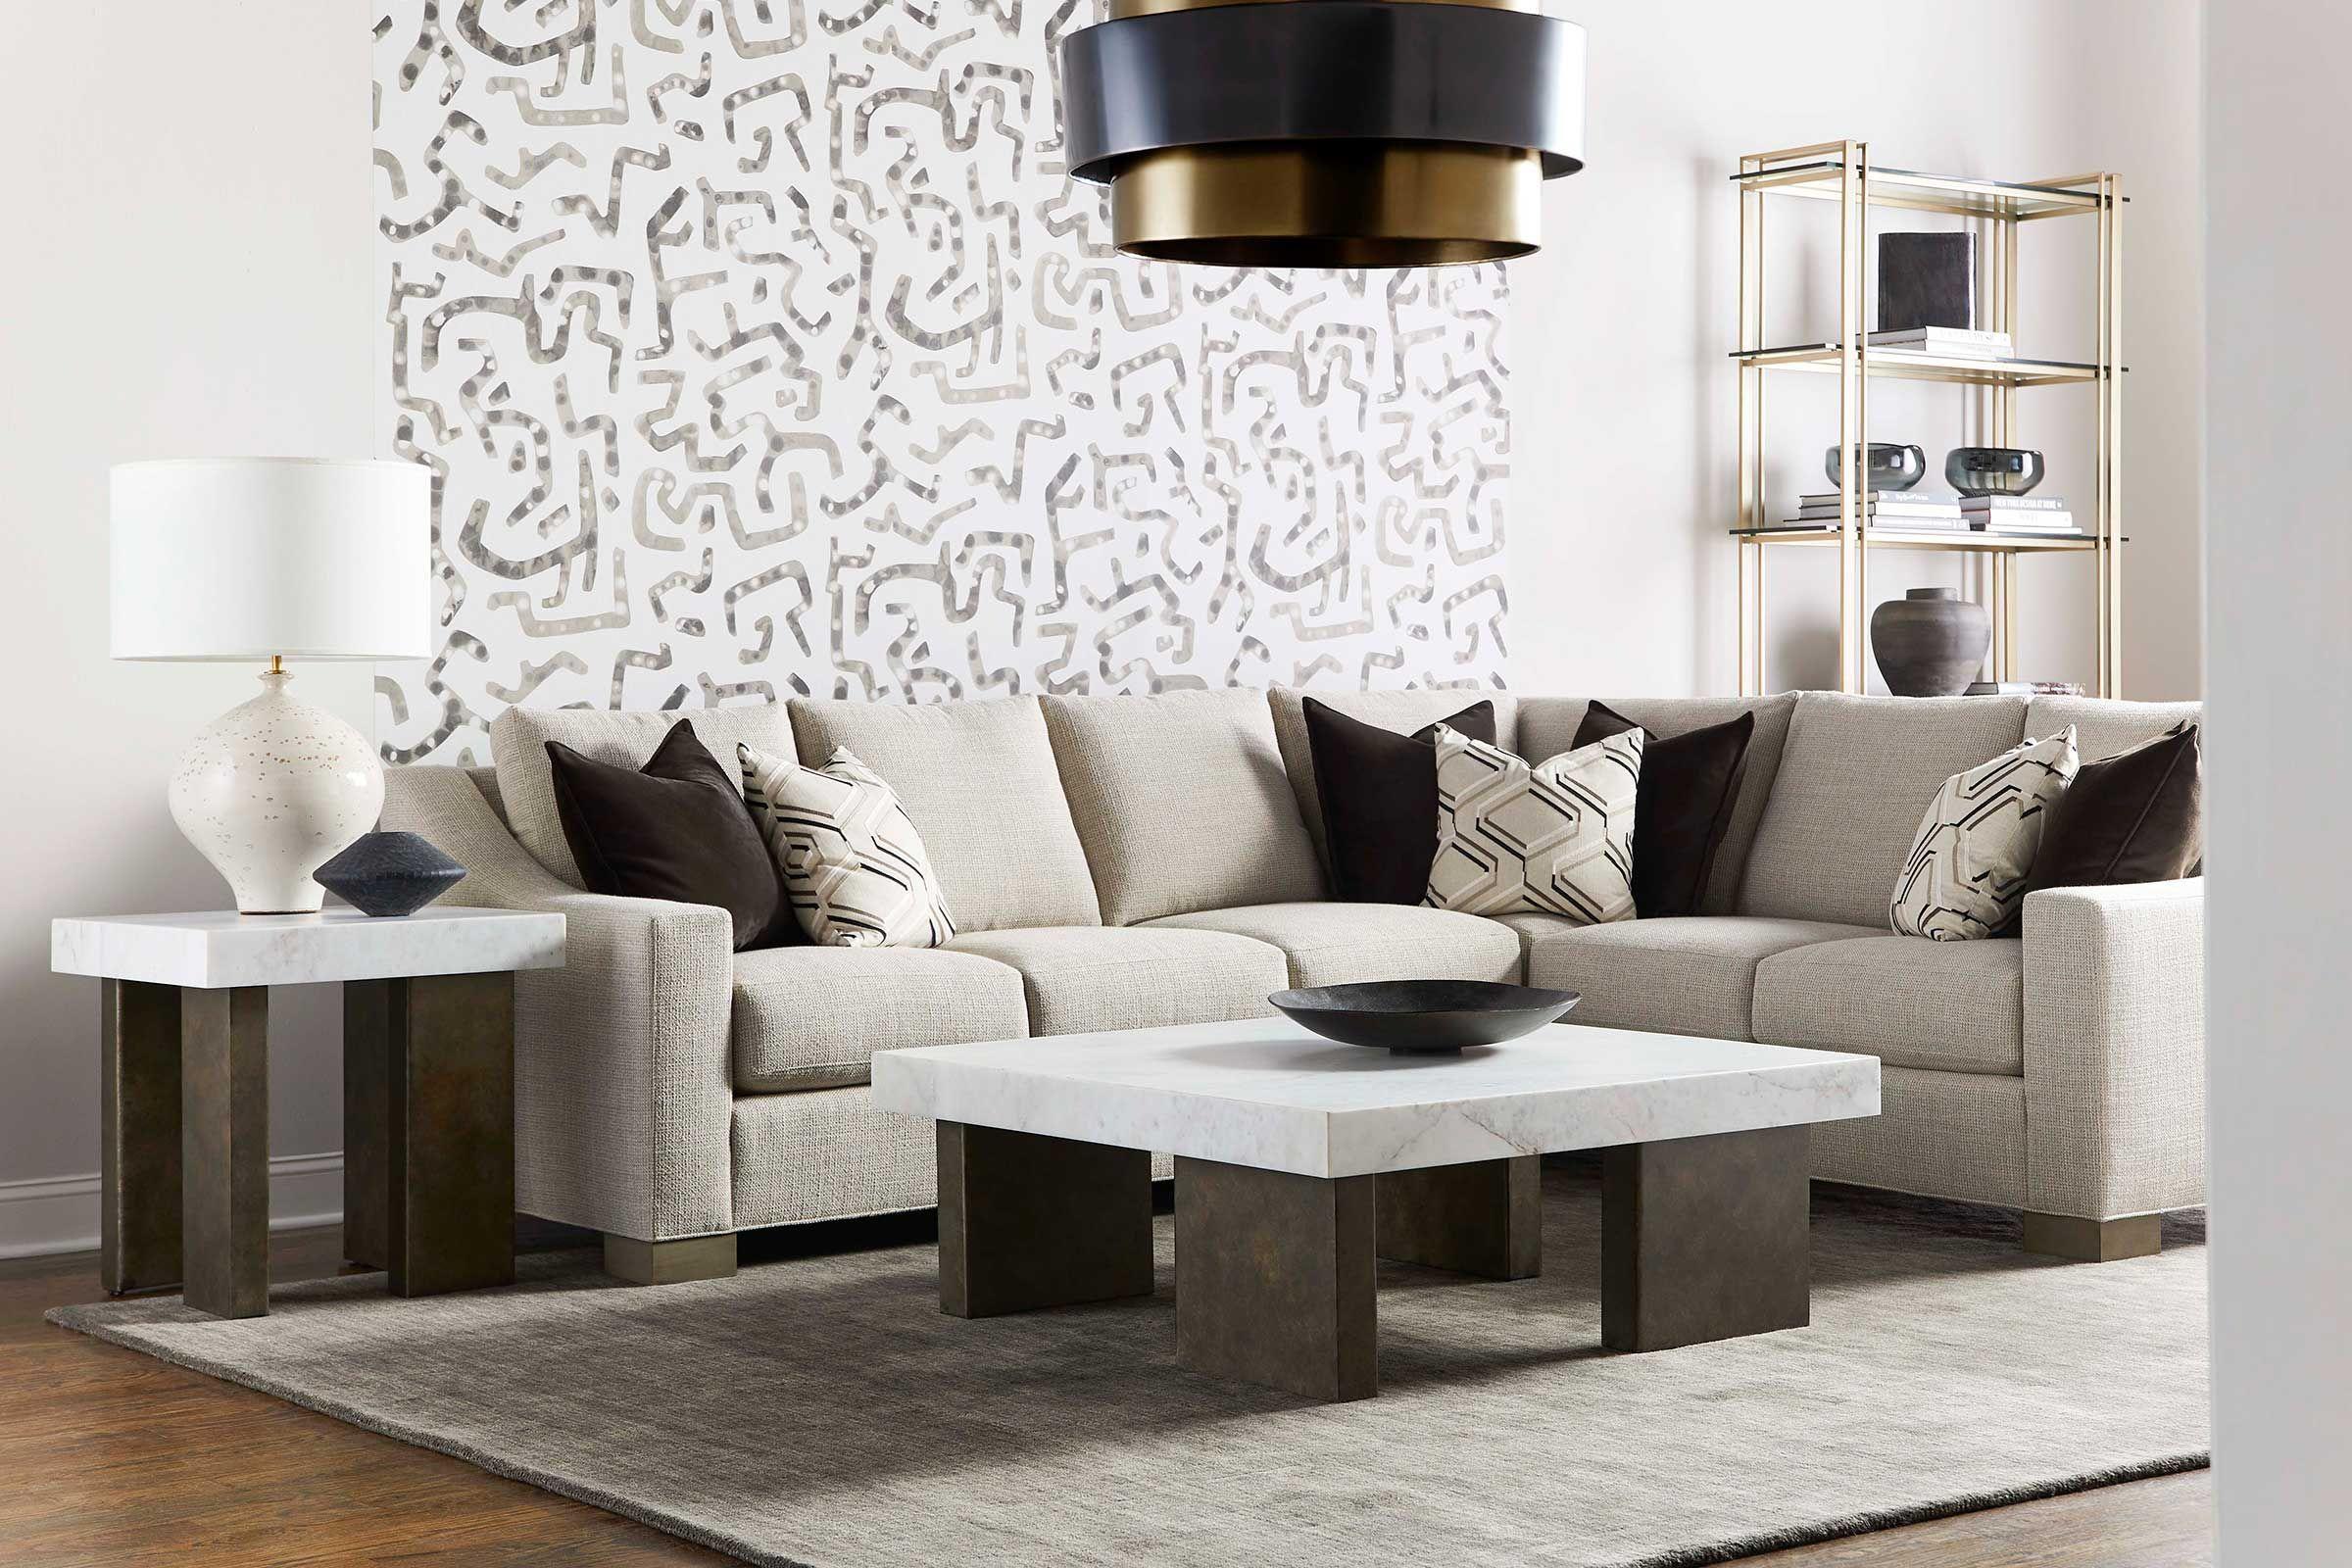 Santa Cruz End Table At Gardner White In 2021 Vanguard Furniture Minimal Living Room Furniture [ 1600 x 2400 Pixel ]